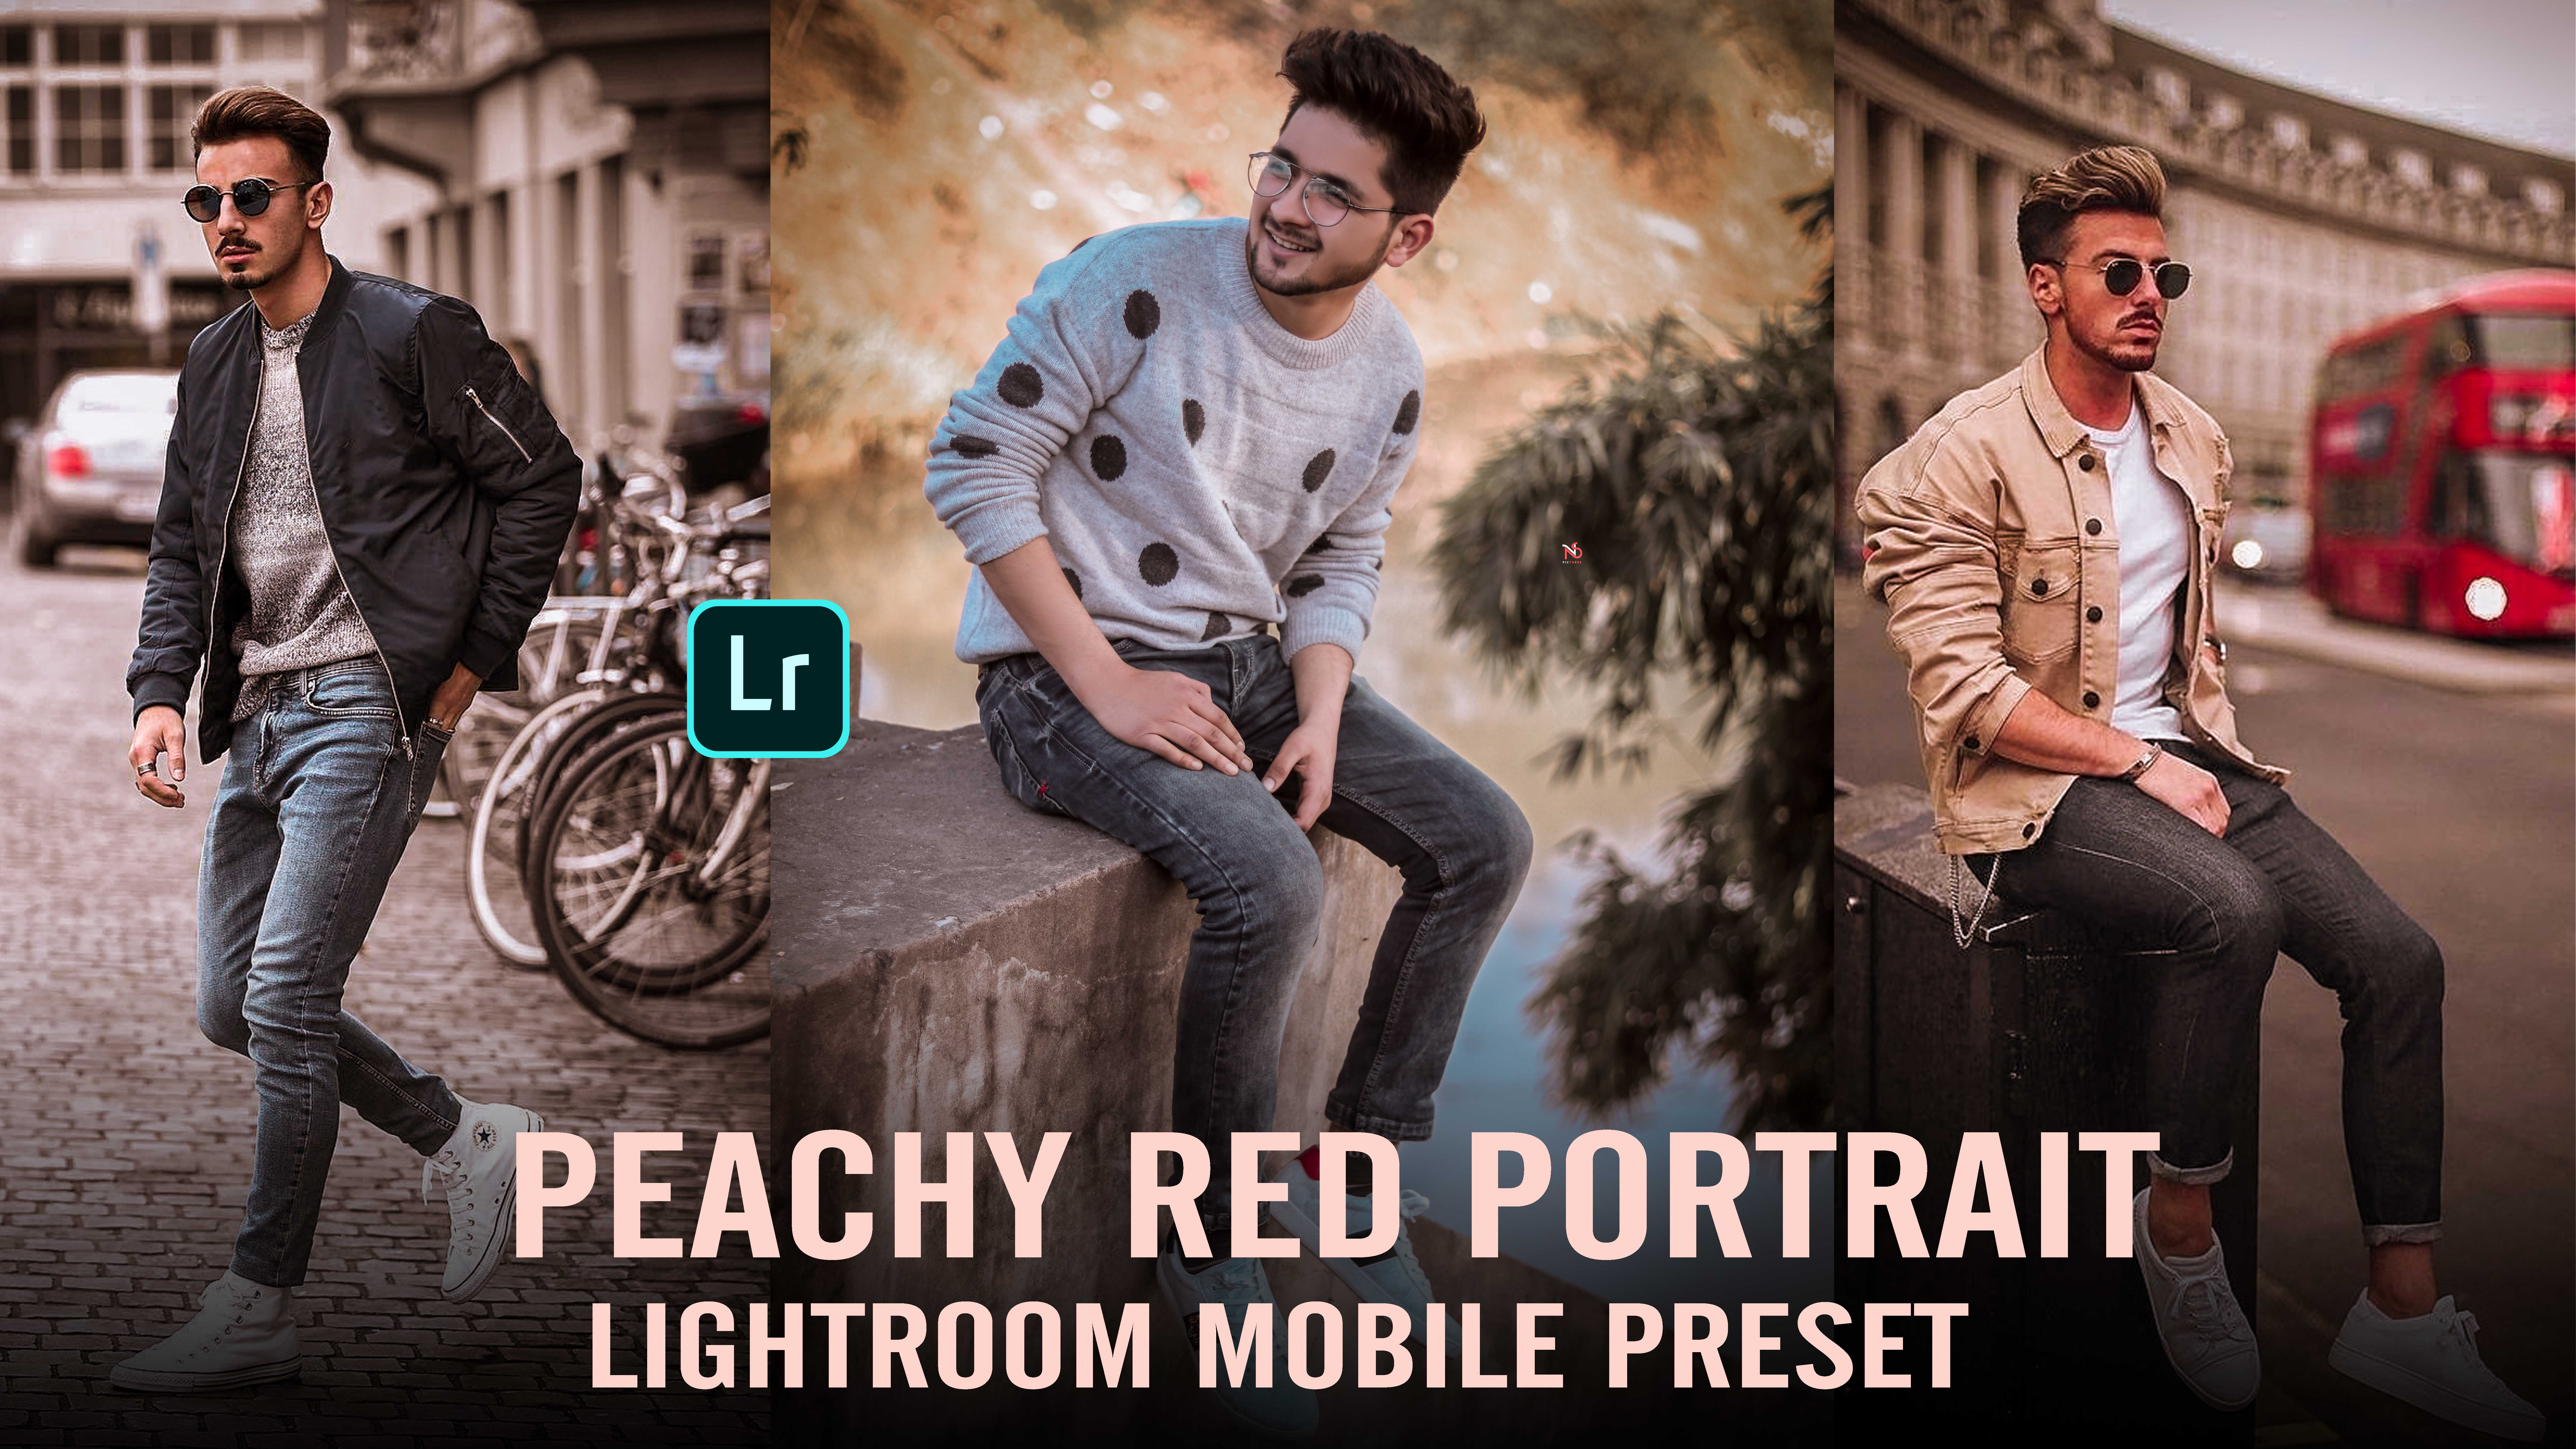 peachy red lightroom preset download - FREE lightroom preset download